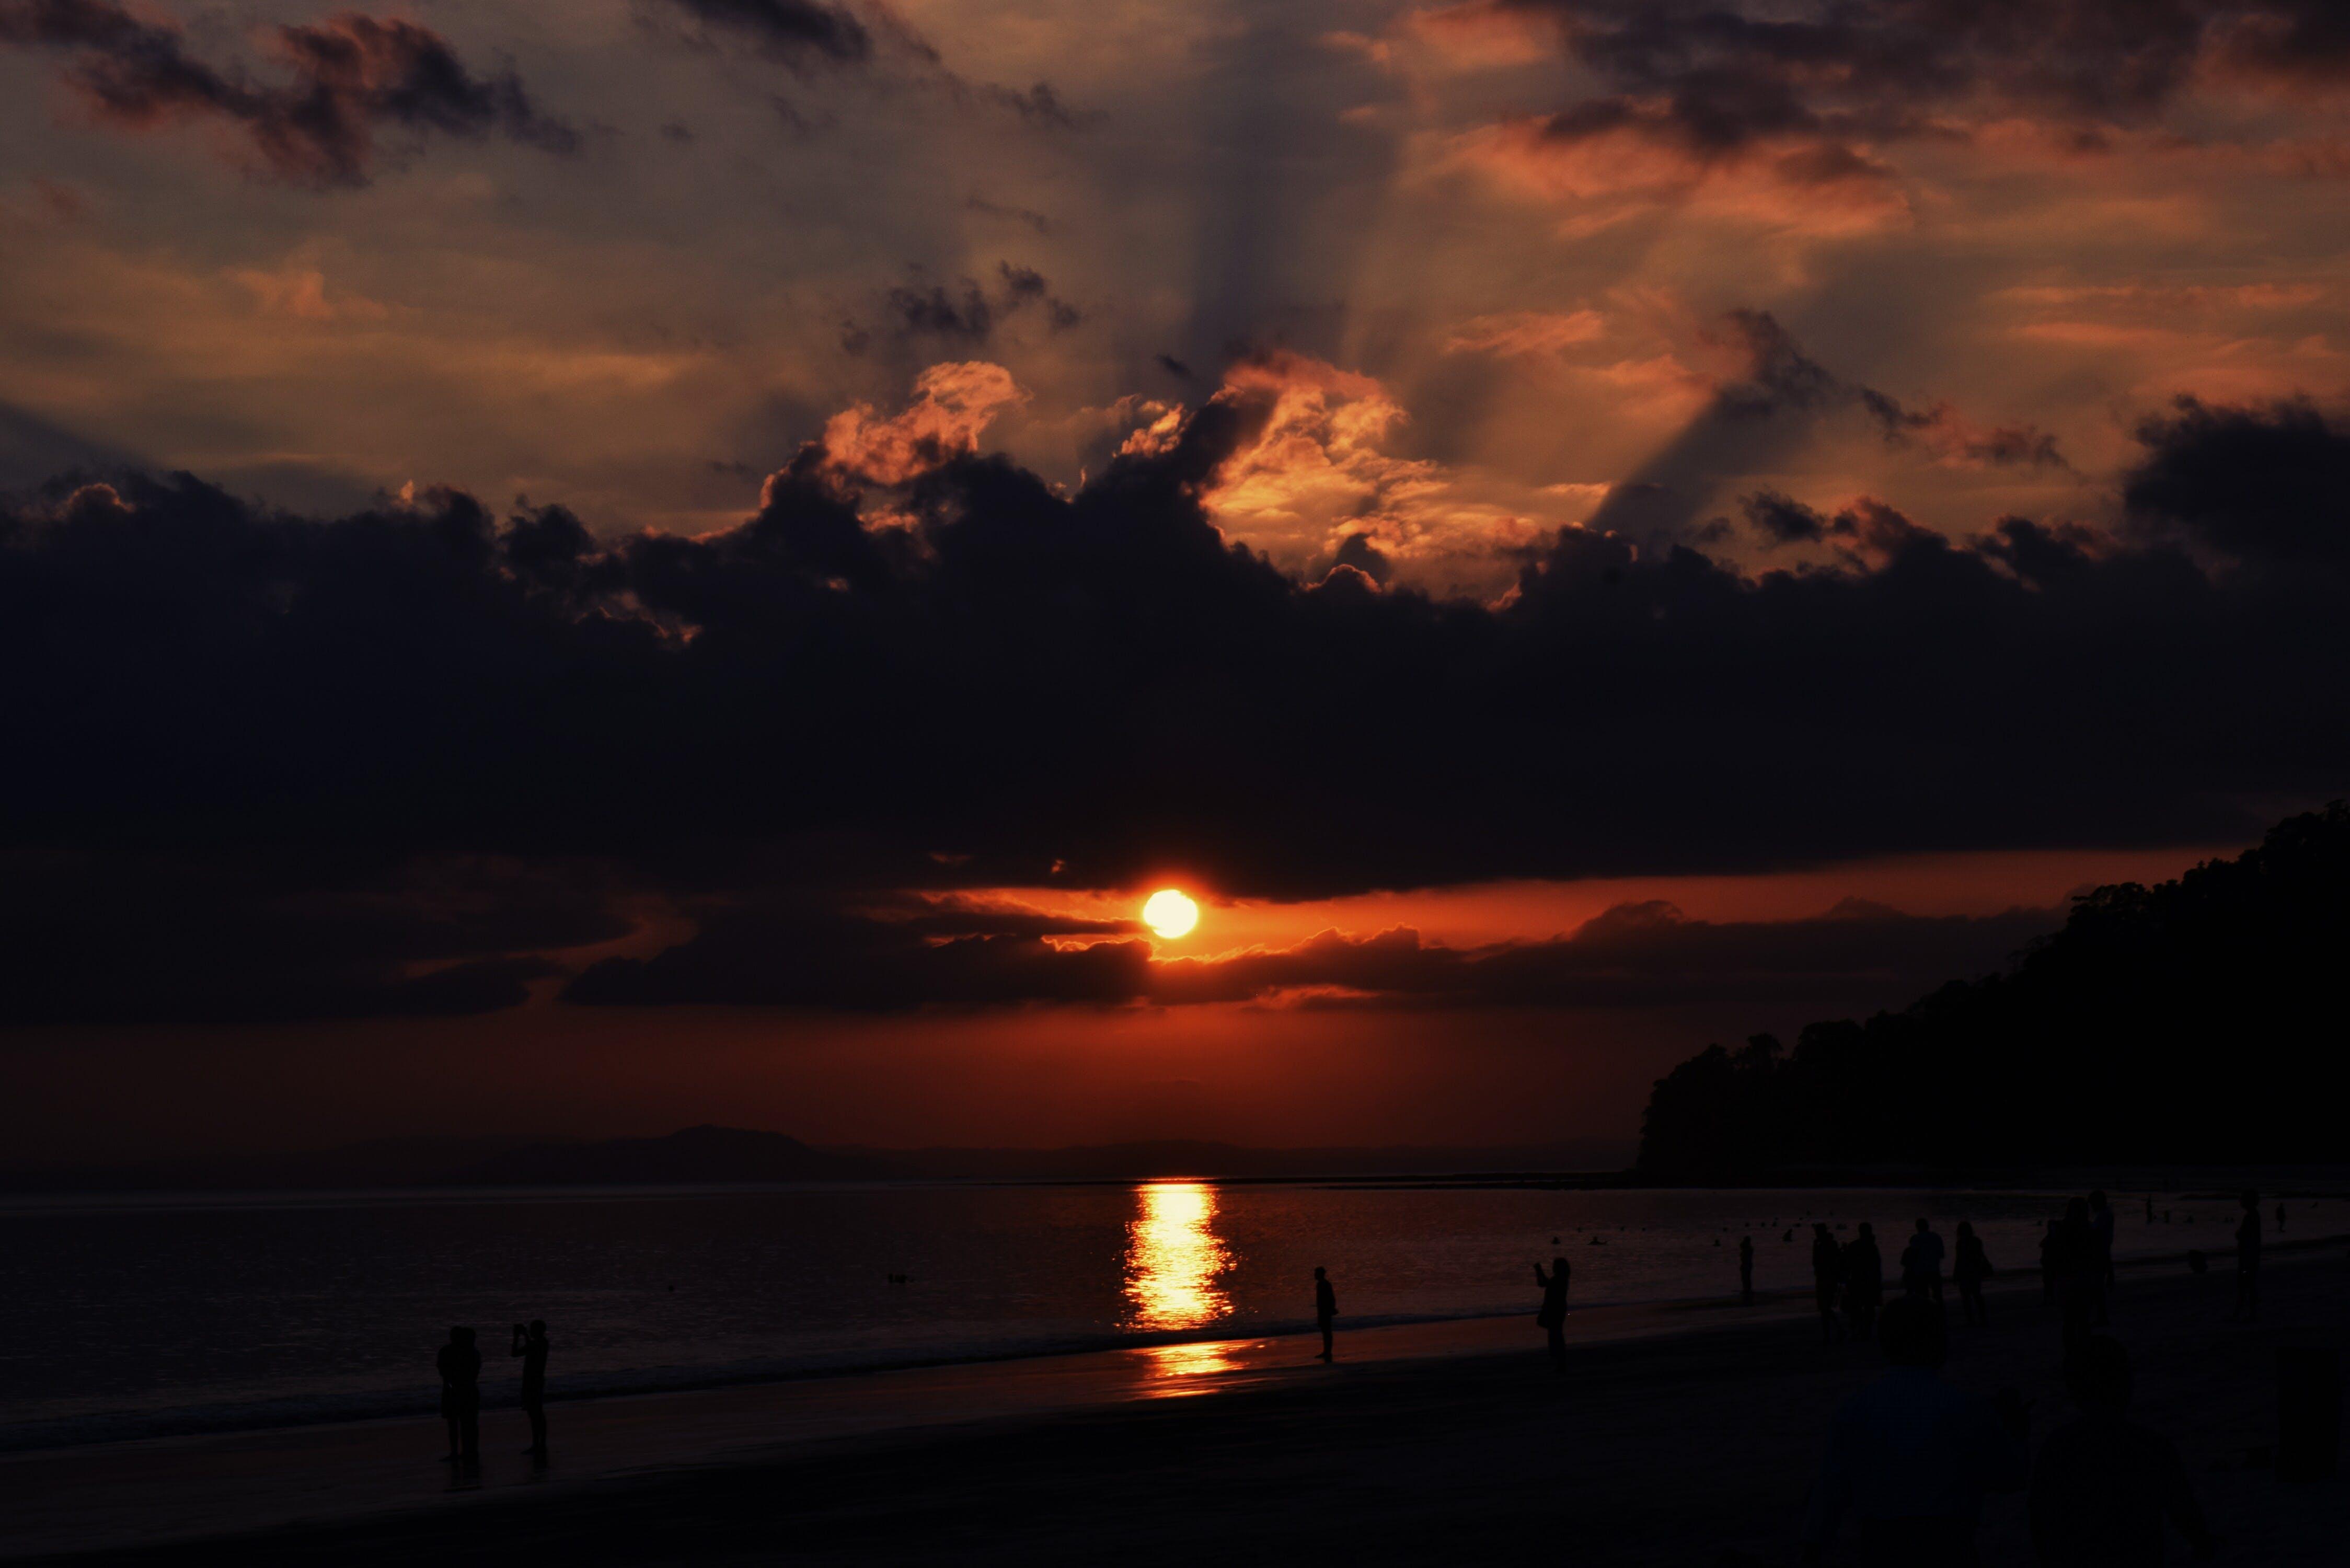 Free stock photo of #nature #photography #sun #rays #light #sunrise #s